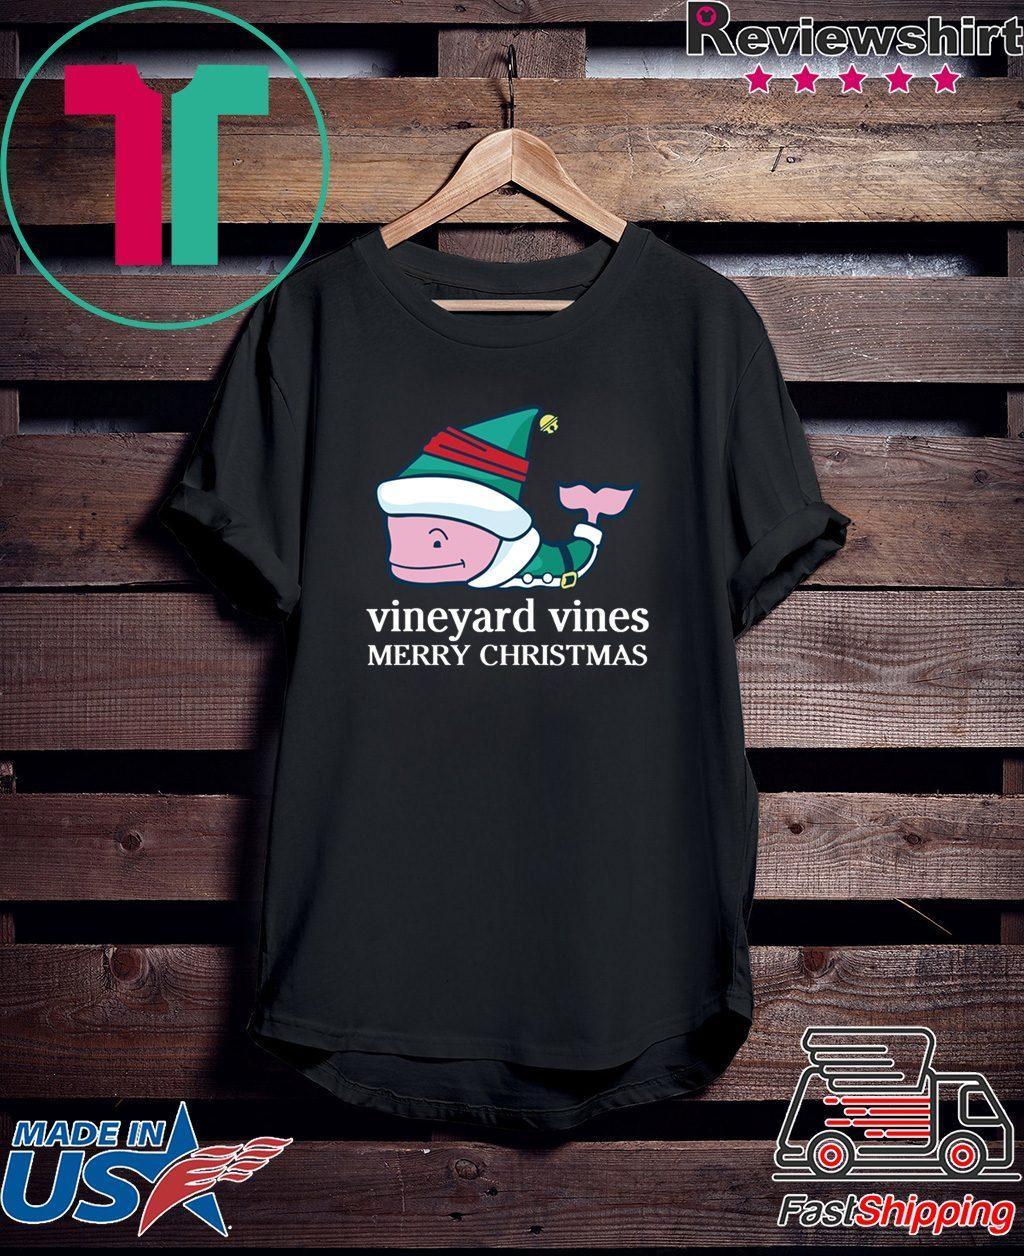 Vineyard Vines Christmas Shirt 2019.Vineyard Vines Christmas Shirt Reviewshirts Office